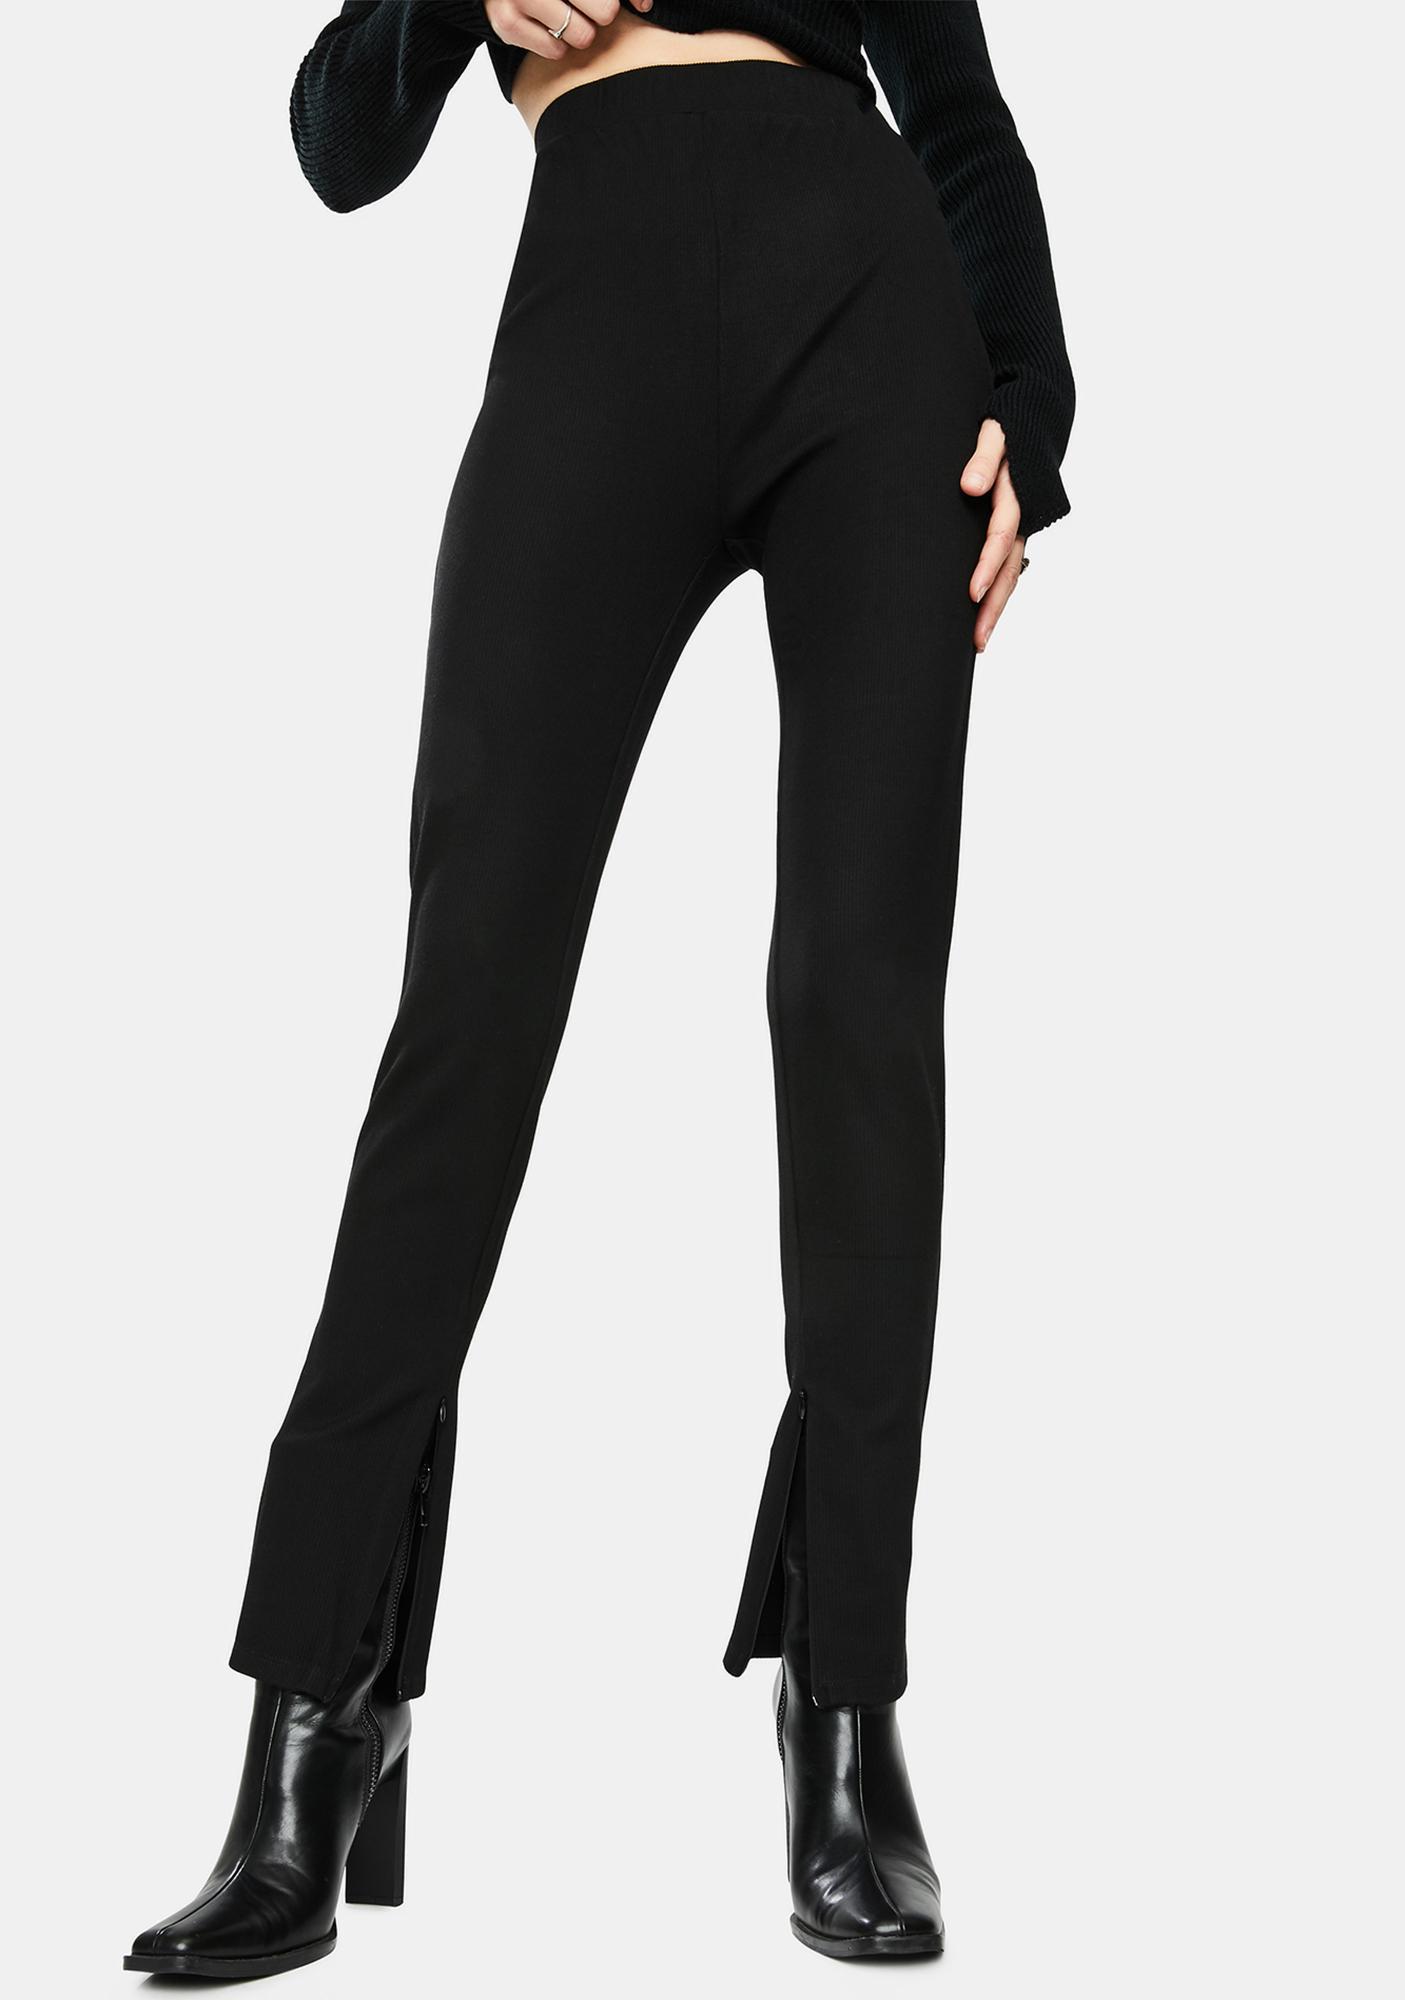 Bailey Rose Bottom Slit Comfy Pants